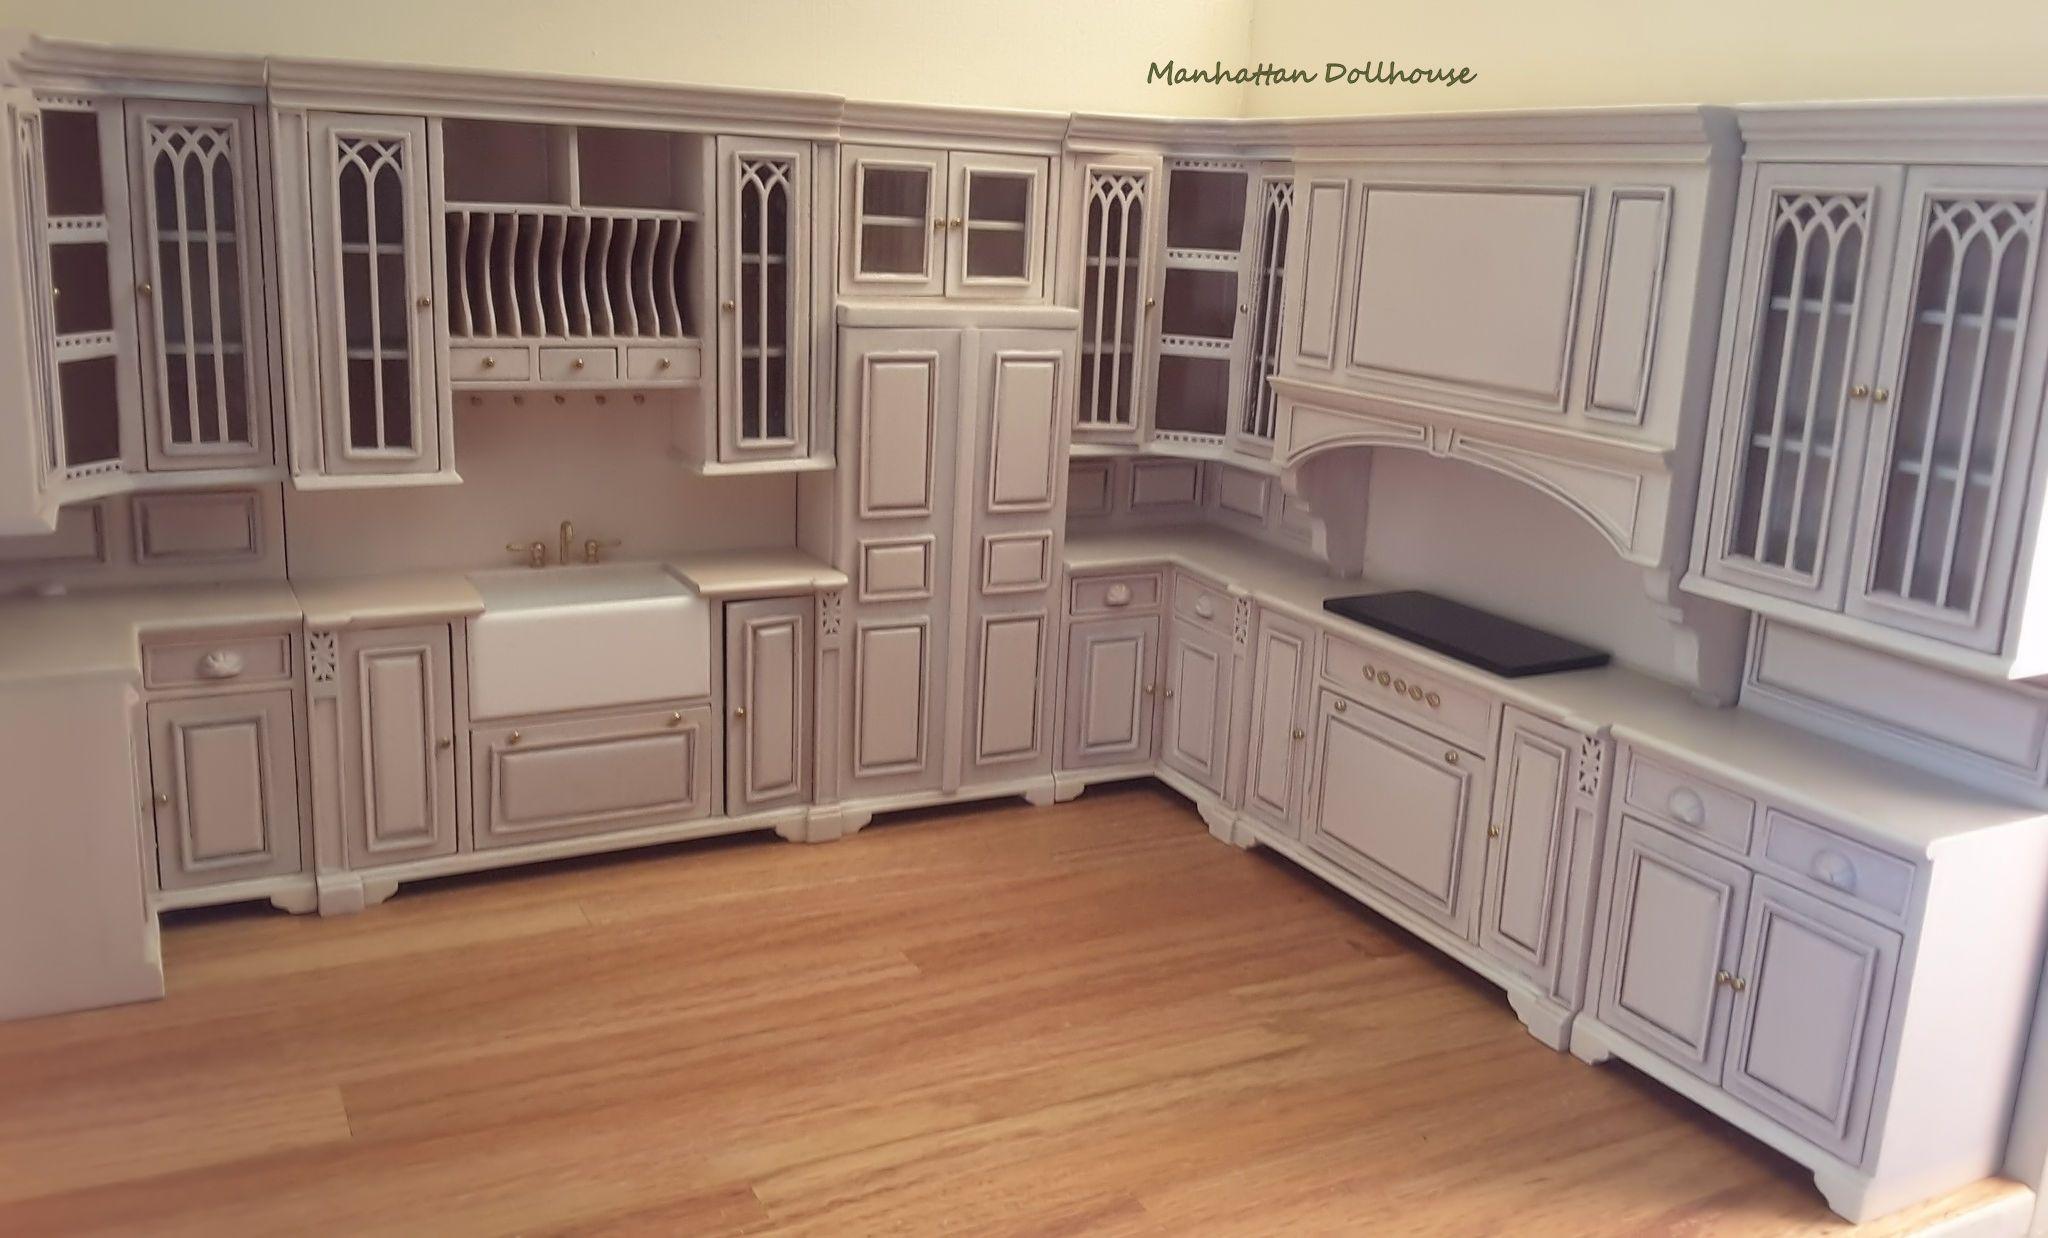 Miniature cambridge manor kitchen set white wash click image to